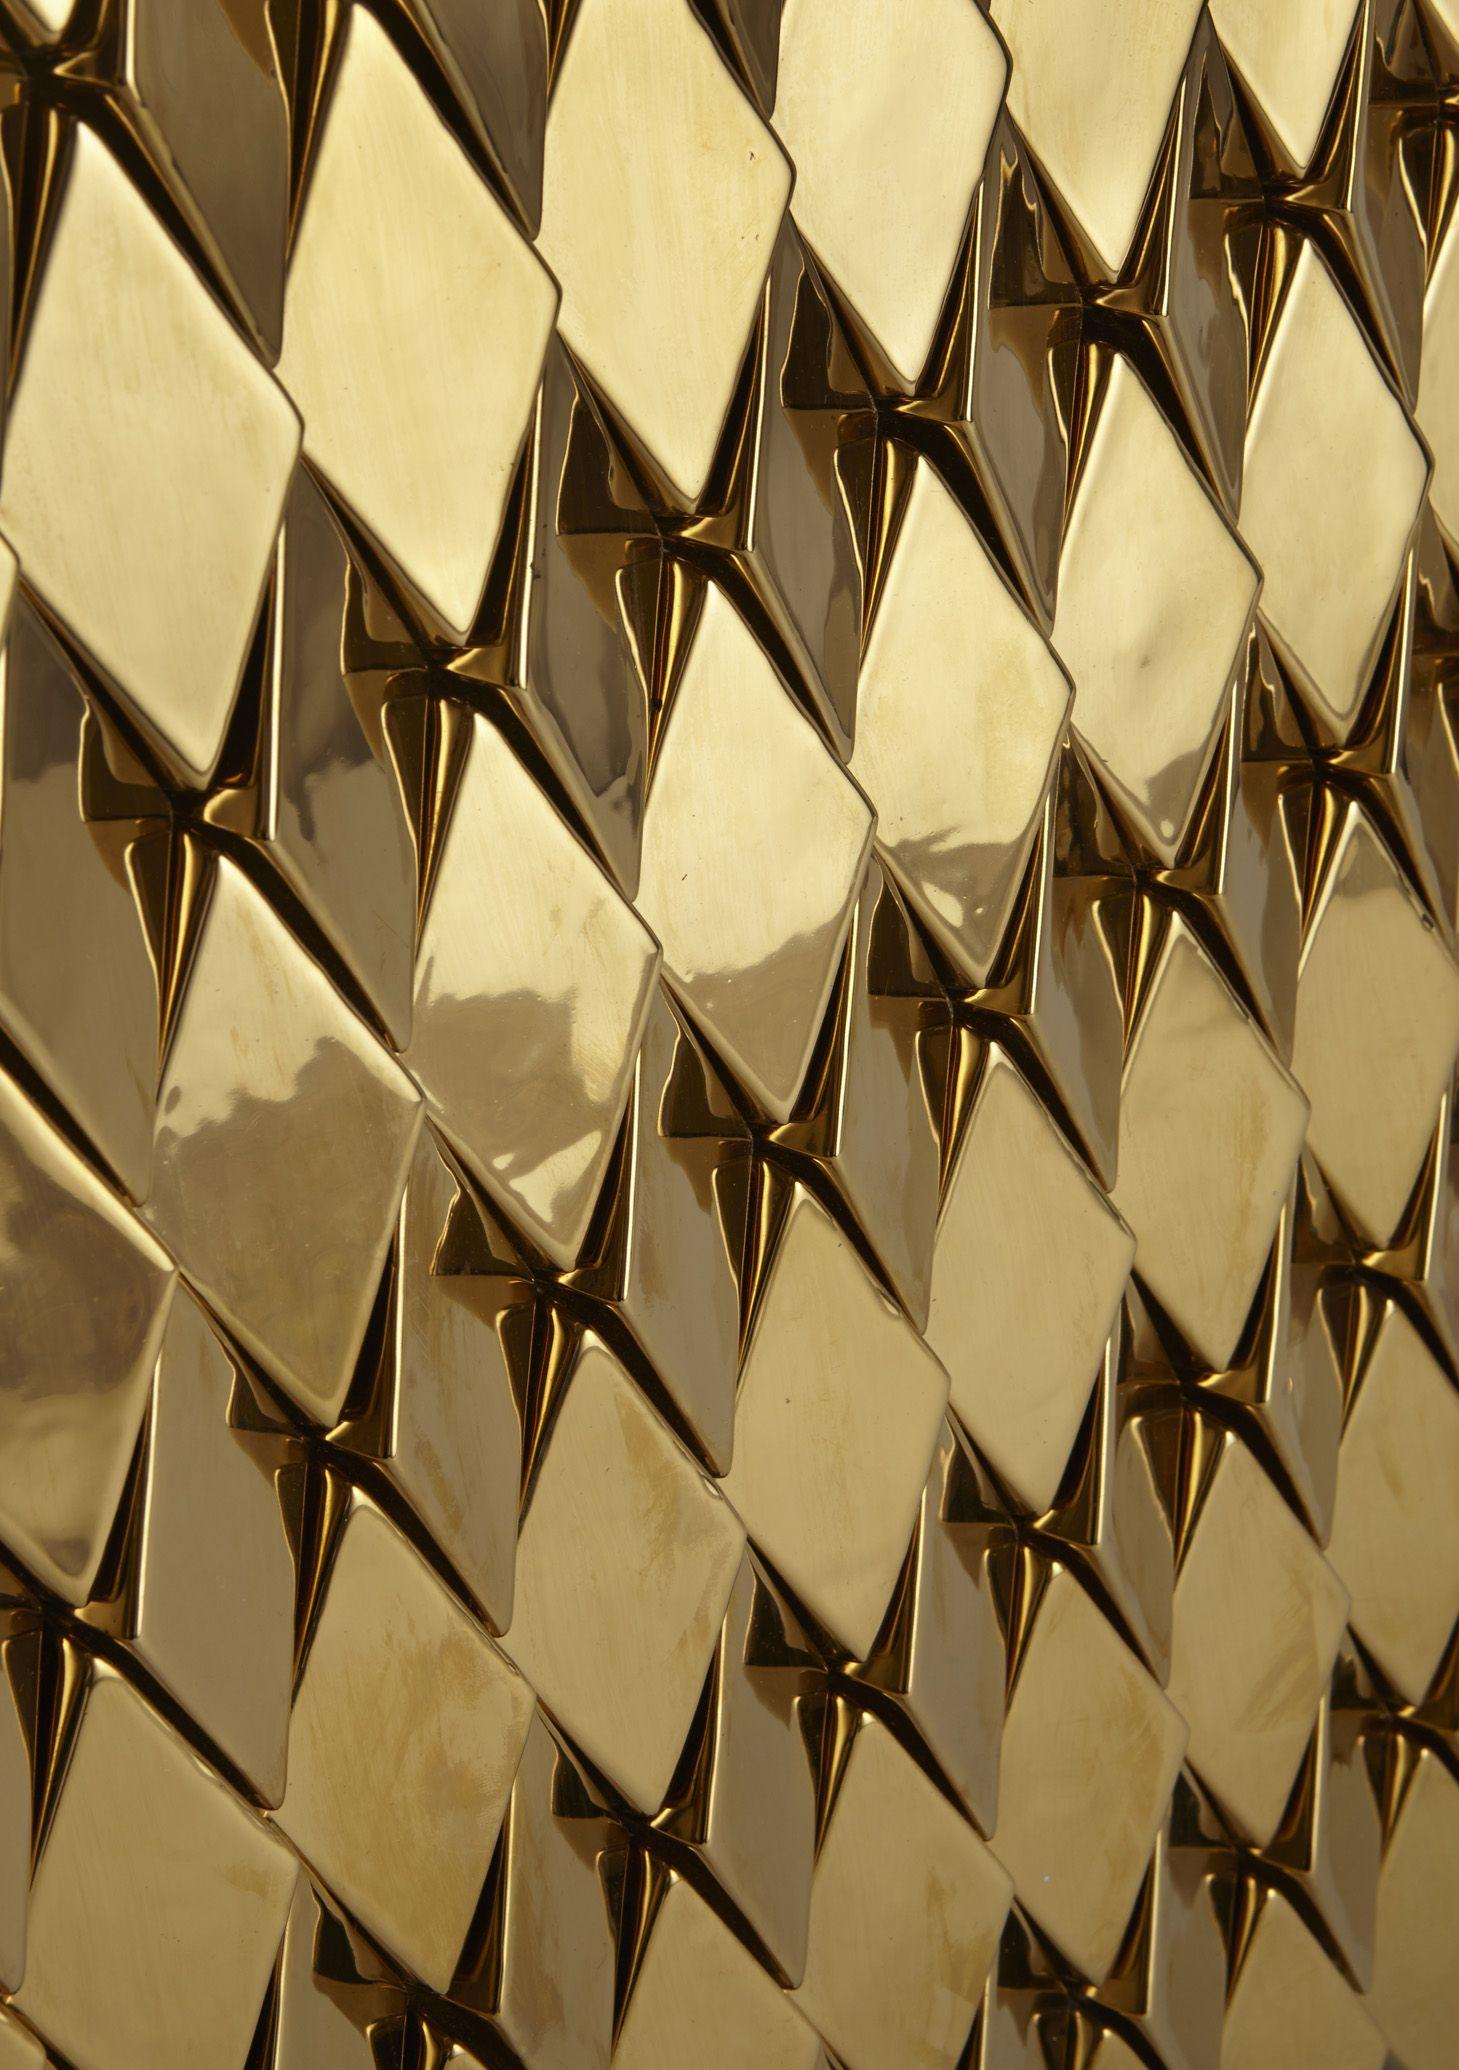 Bespoke Global Product Detail Wellington High Gloss Metallic Gold Tile Shades Of Gold Surface Design